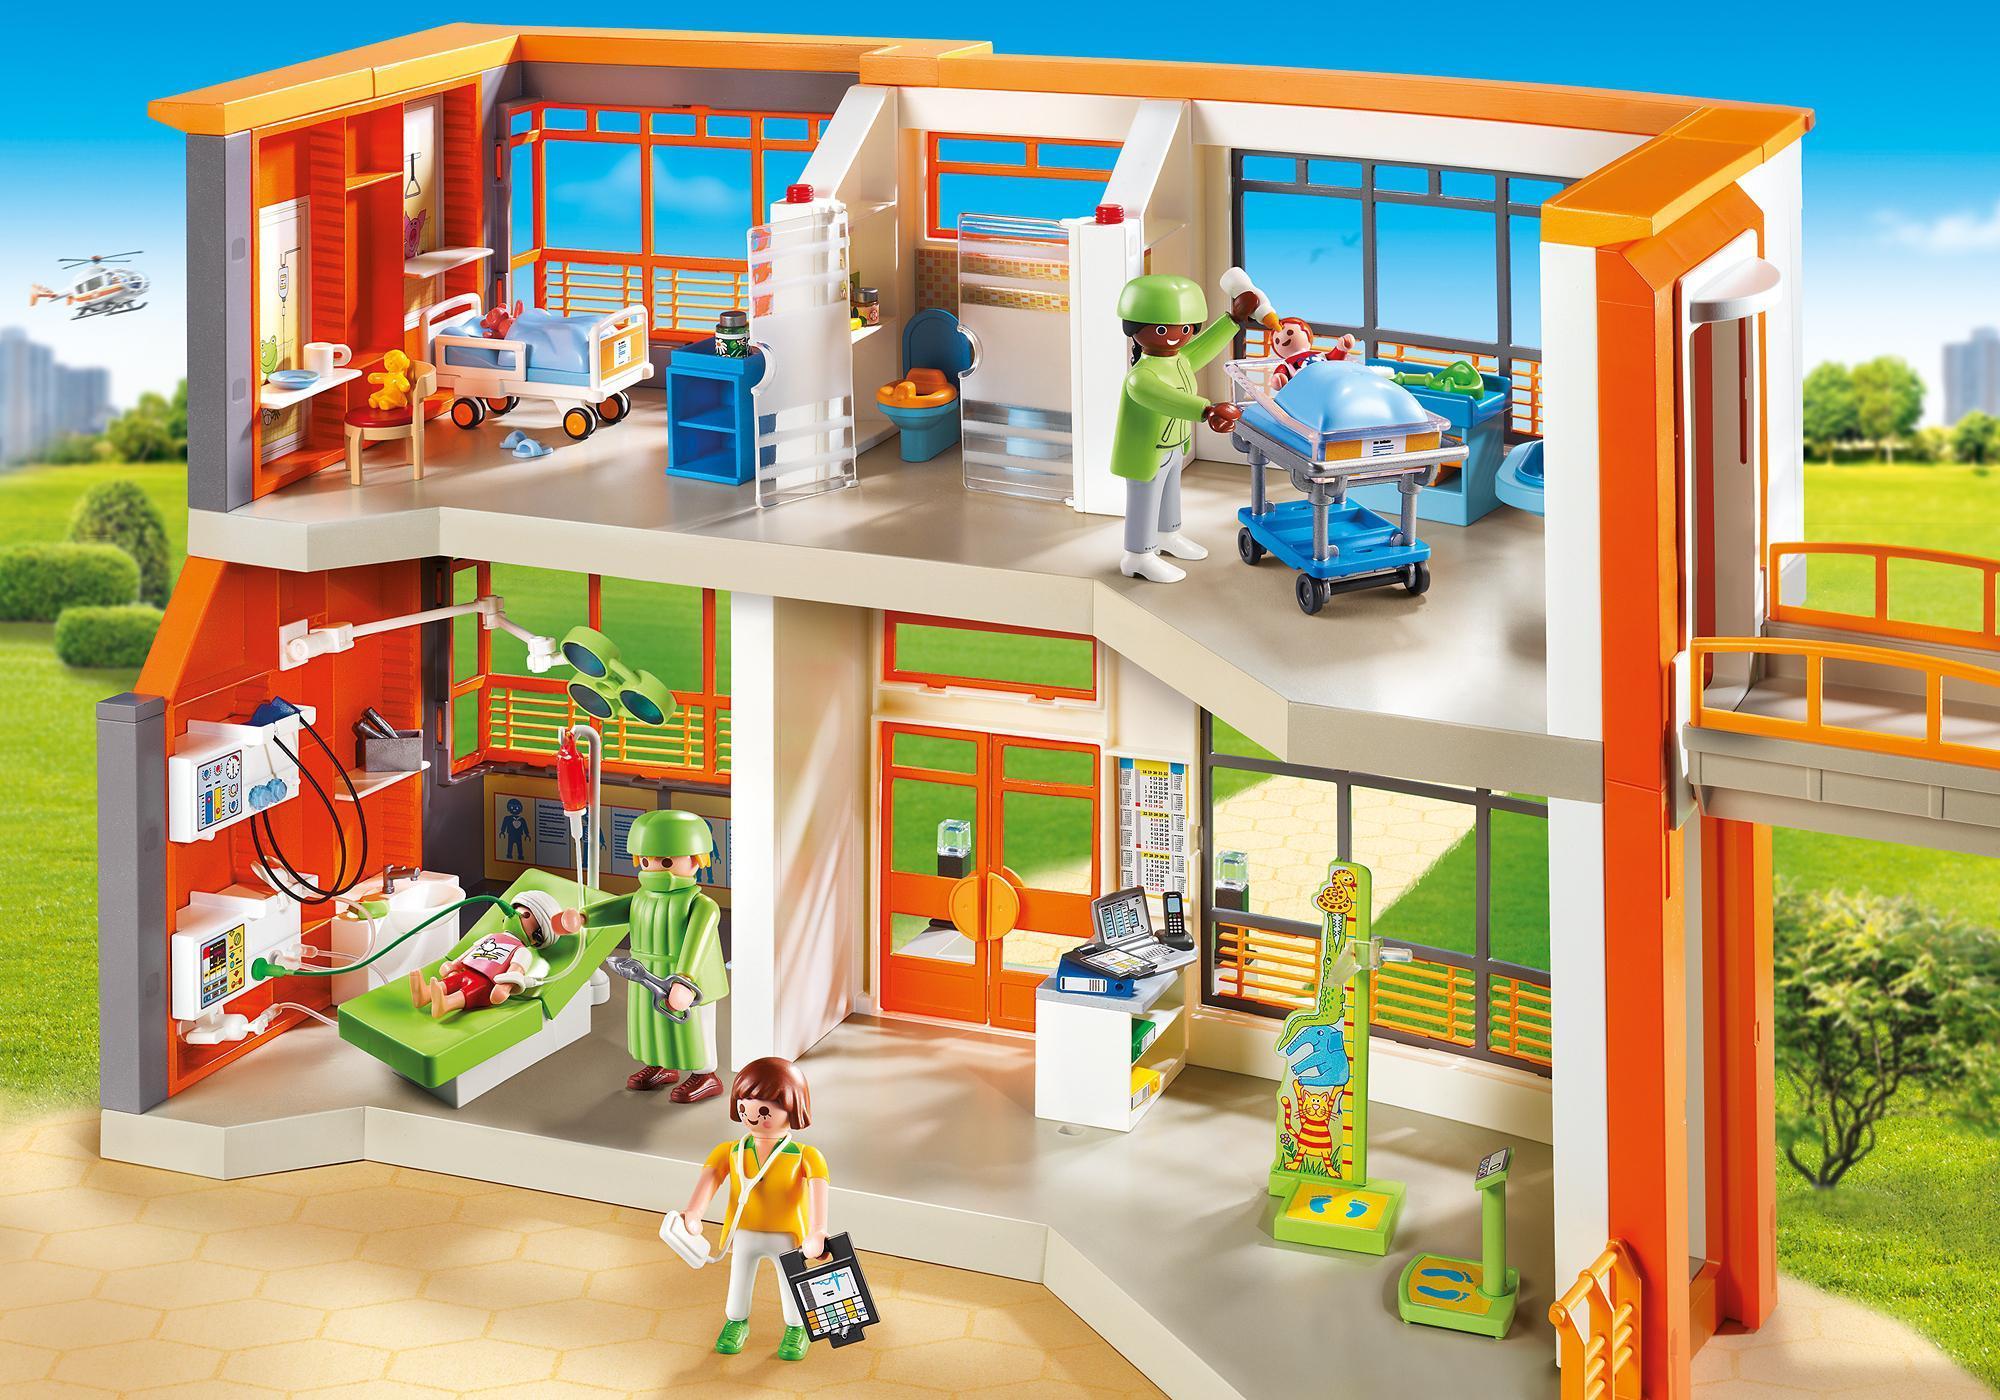 6657_product_detail/Compleet ingericht kinderziekenhuis